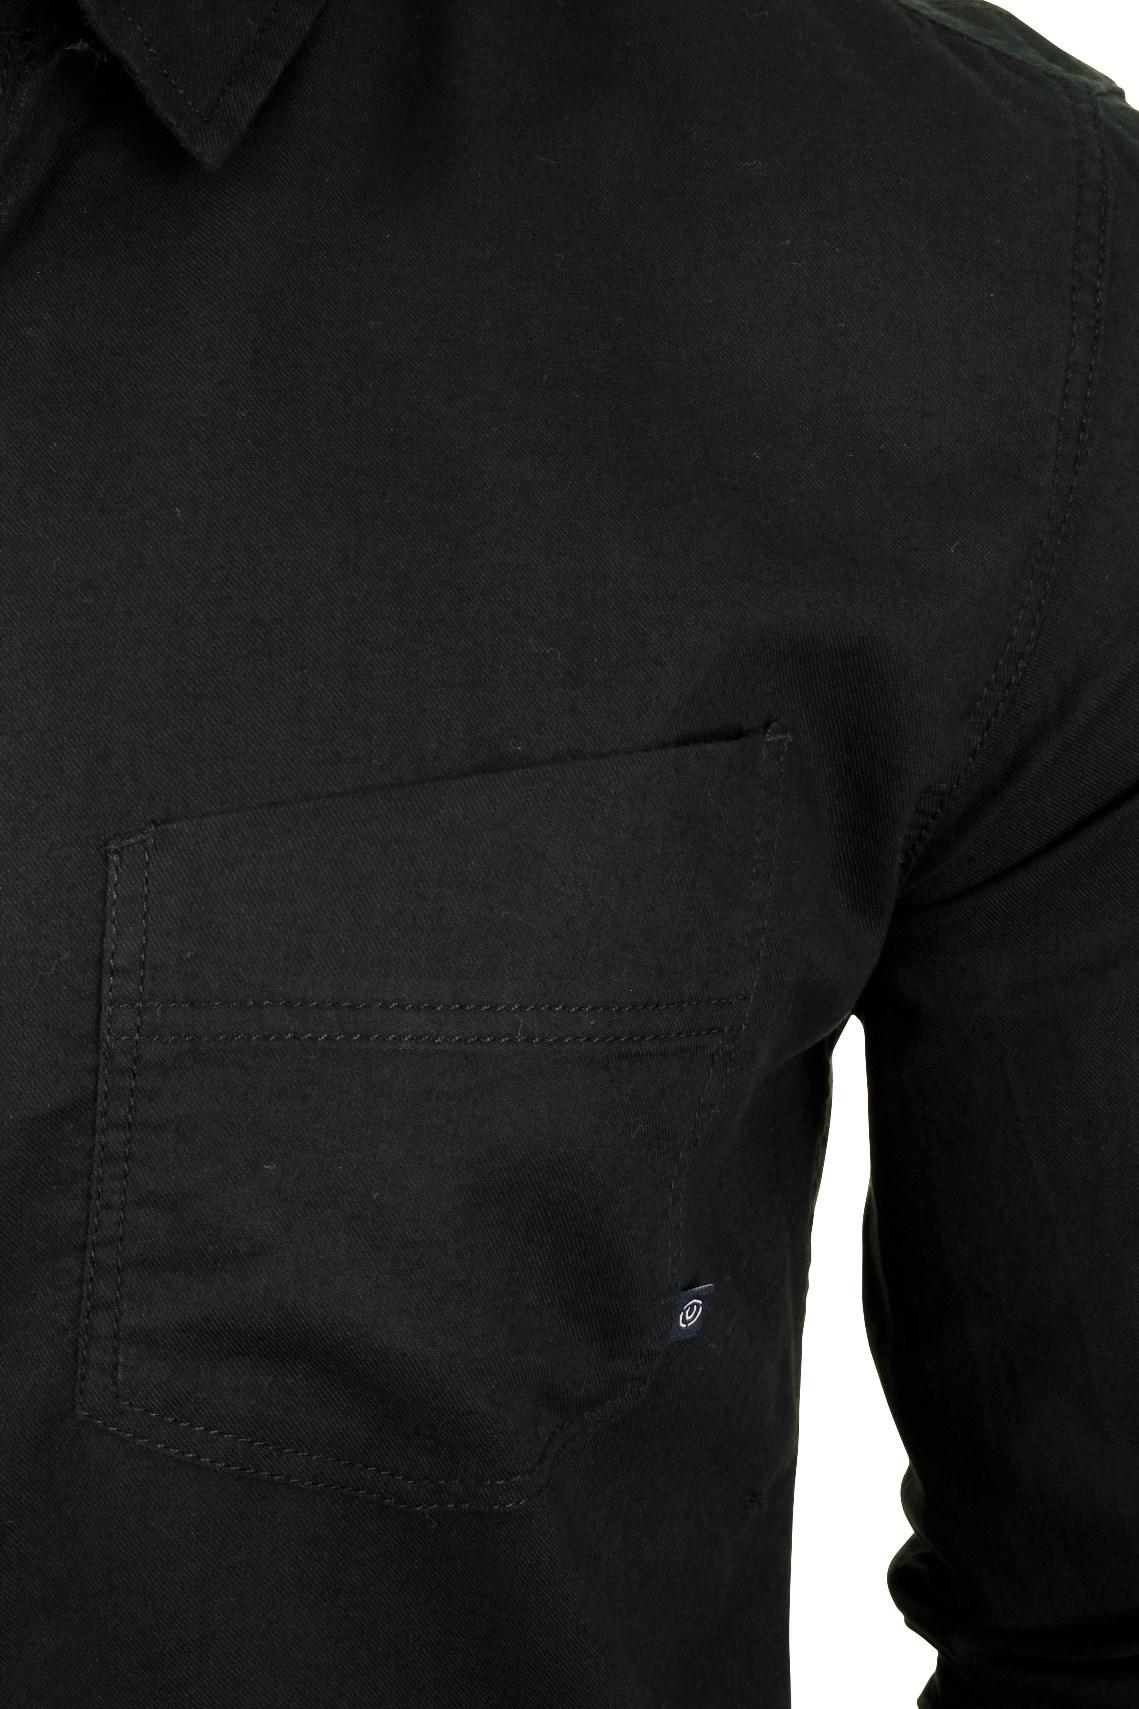 Para-Hombre-Franela-Camisa-por-Pato-Y-Cubierta-039-Katlego-039-Manga-Larga miniatura 4